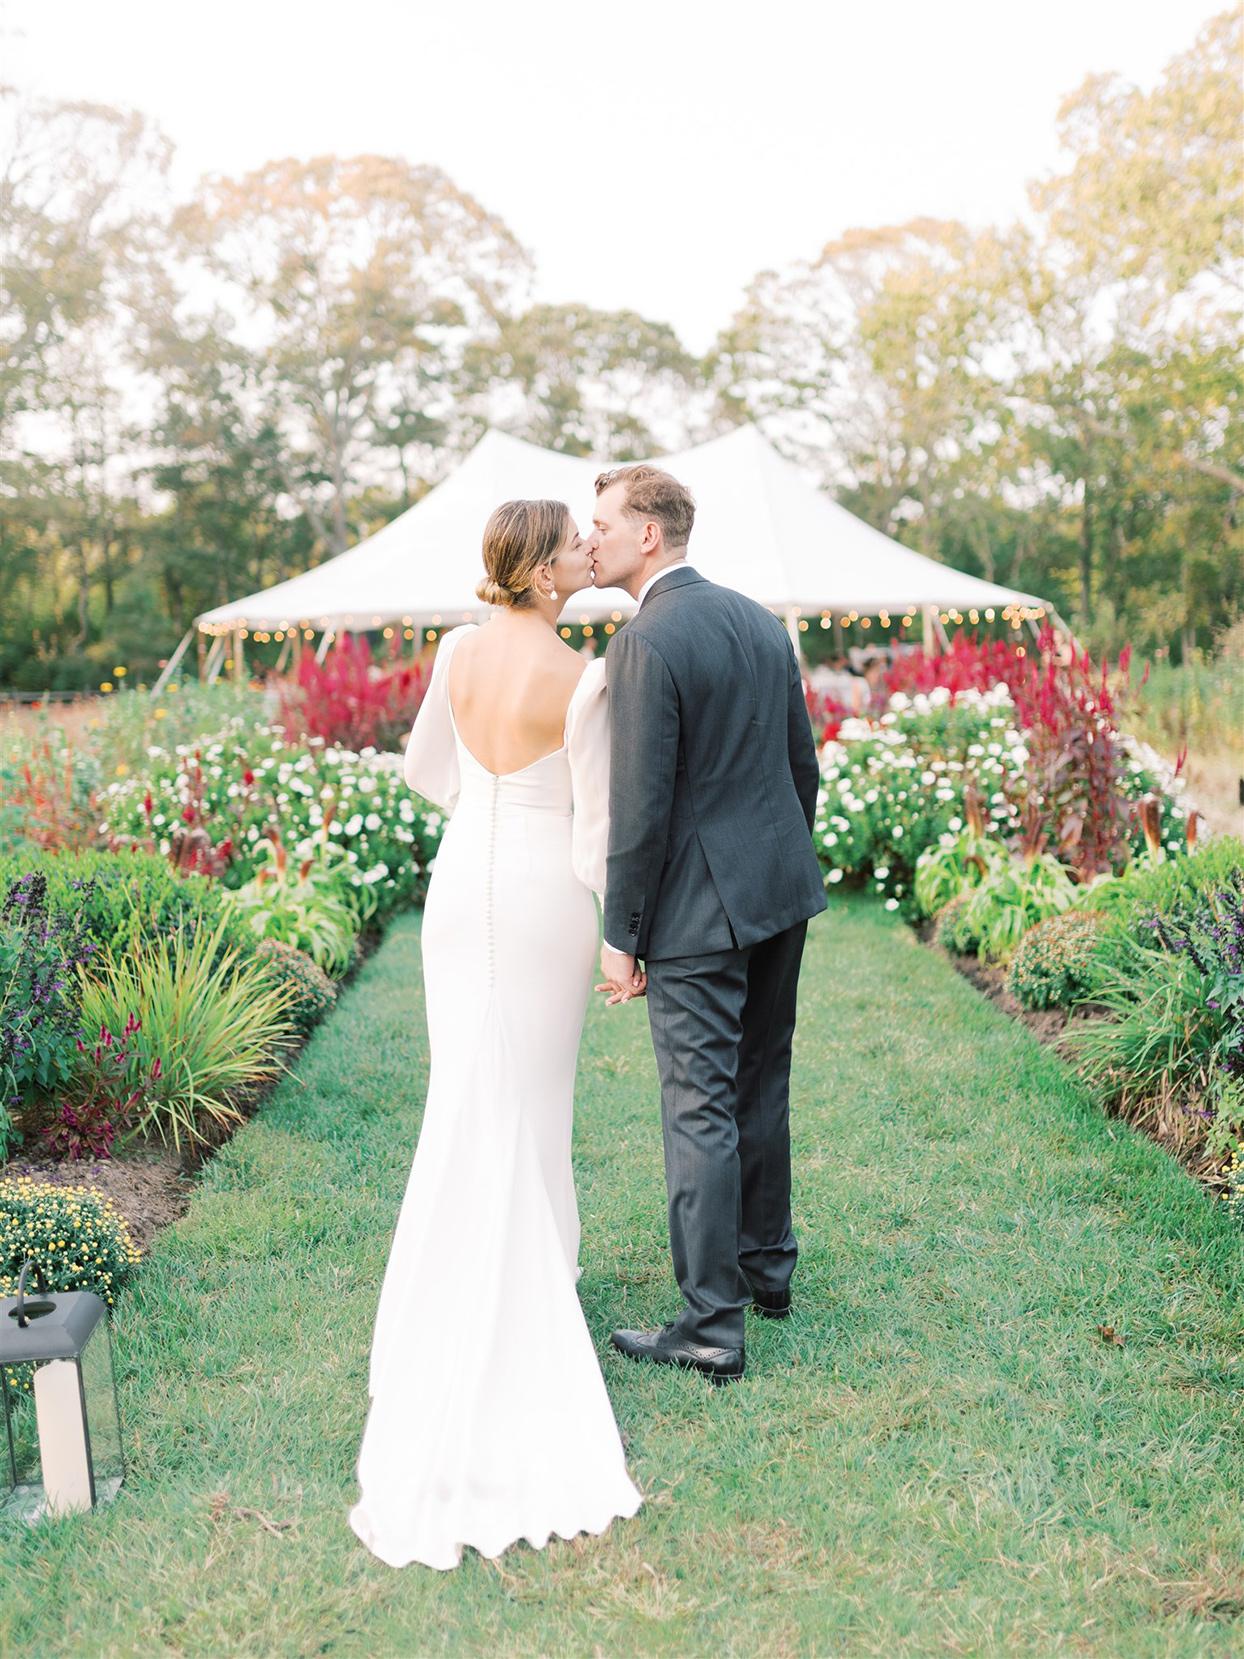 samantha cody wedding couple kissing in garden